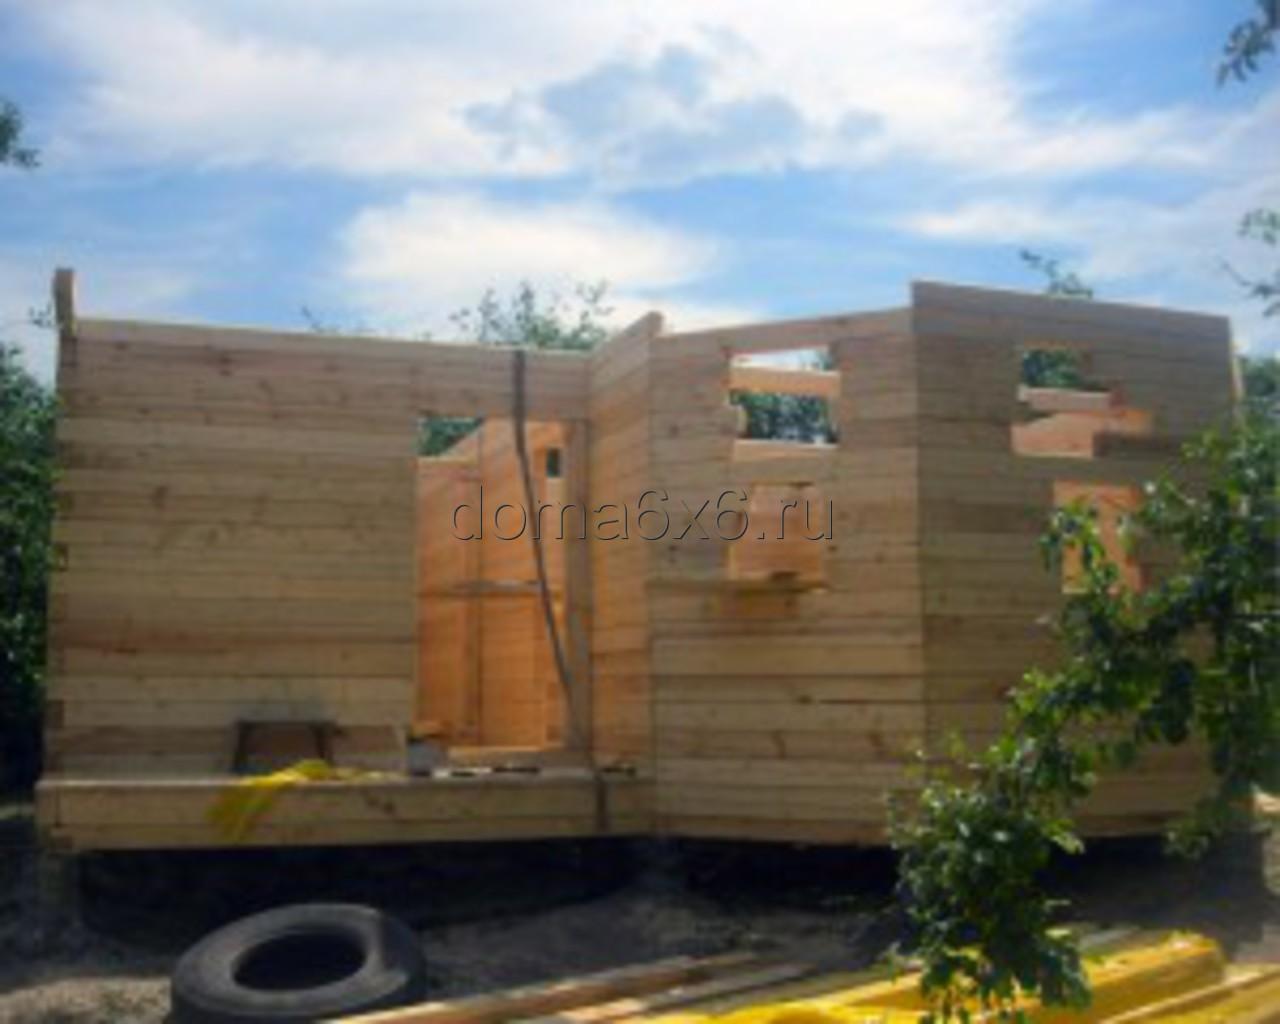 Строительство дома из бруса в Рязани - 1